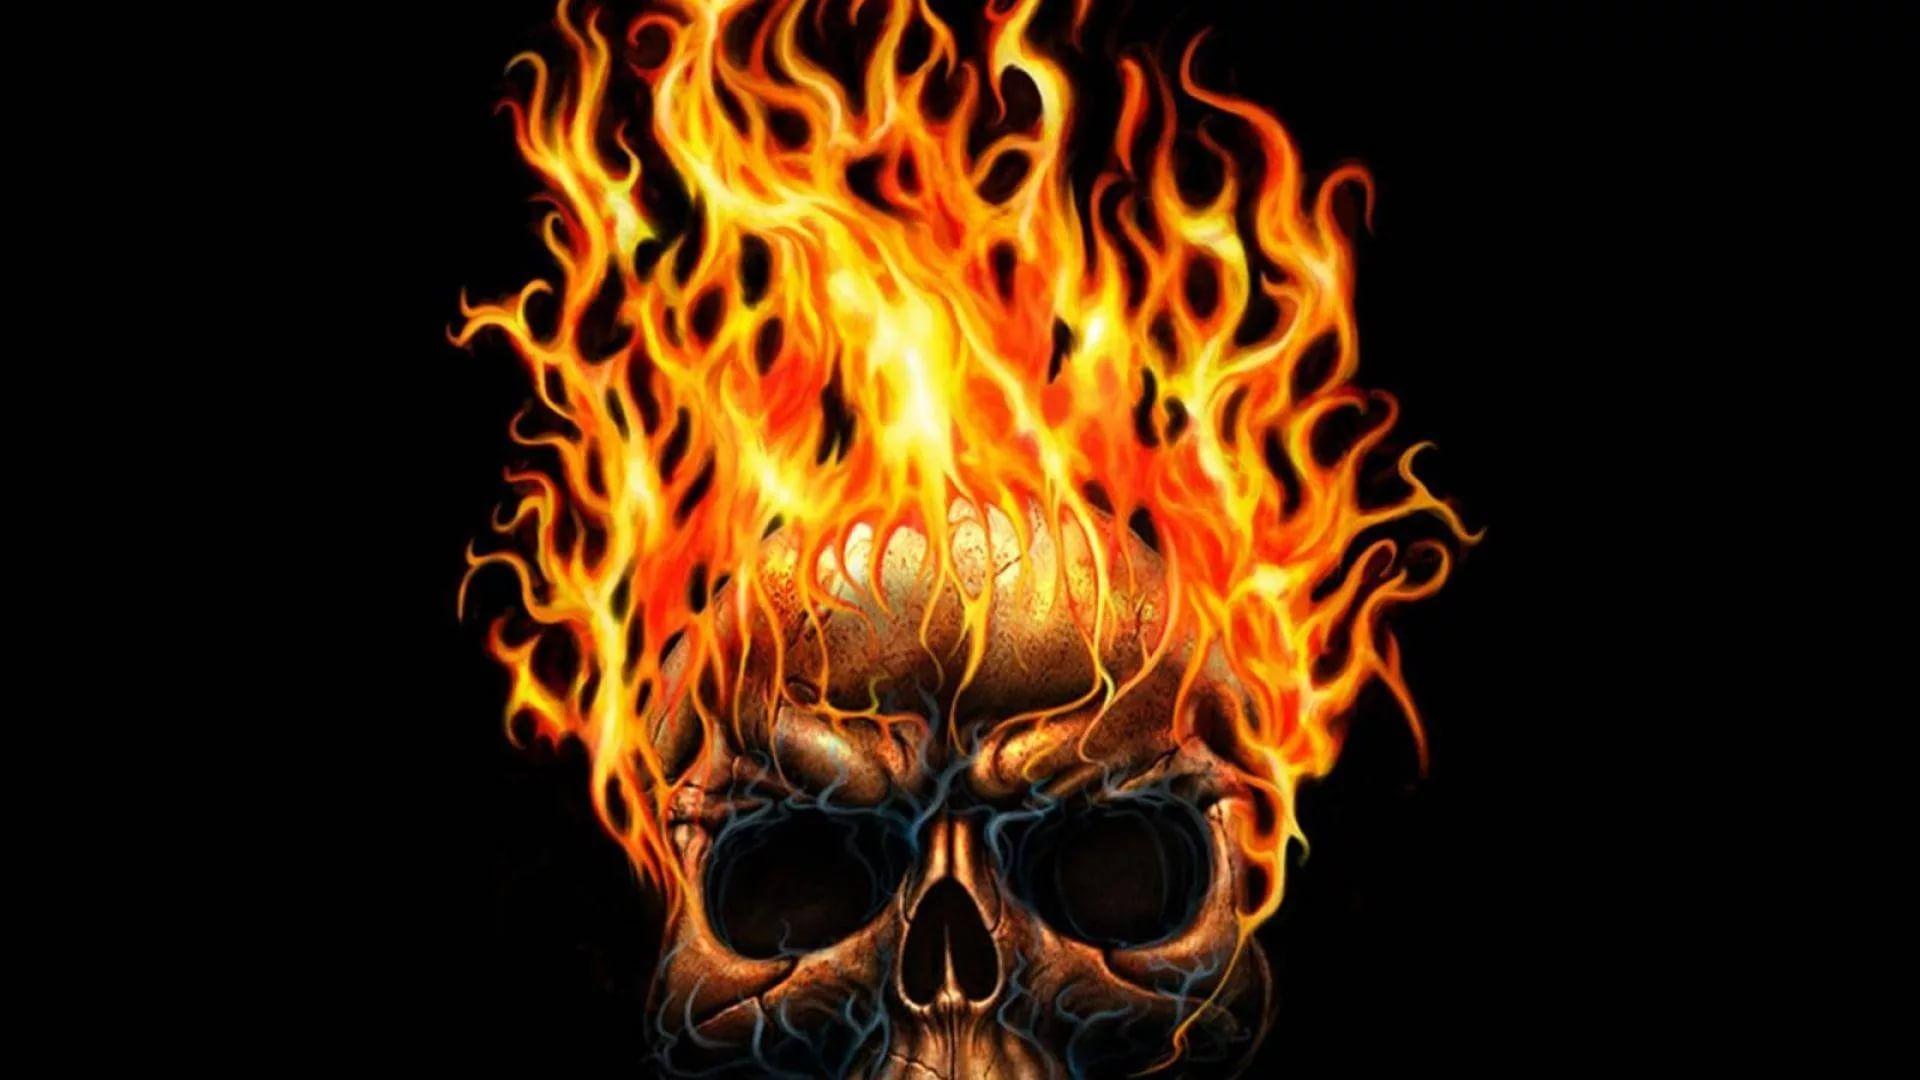 Flaming Skull wallpaper image hd